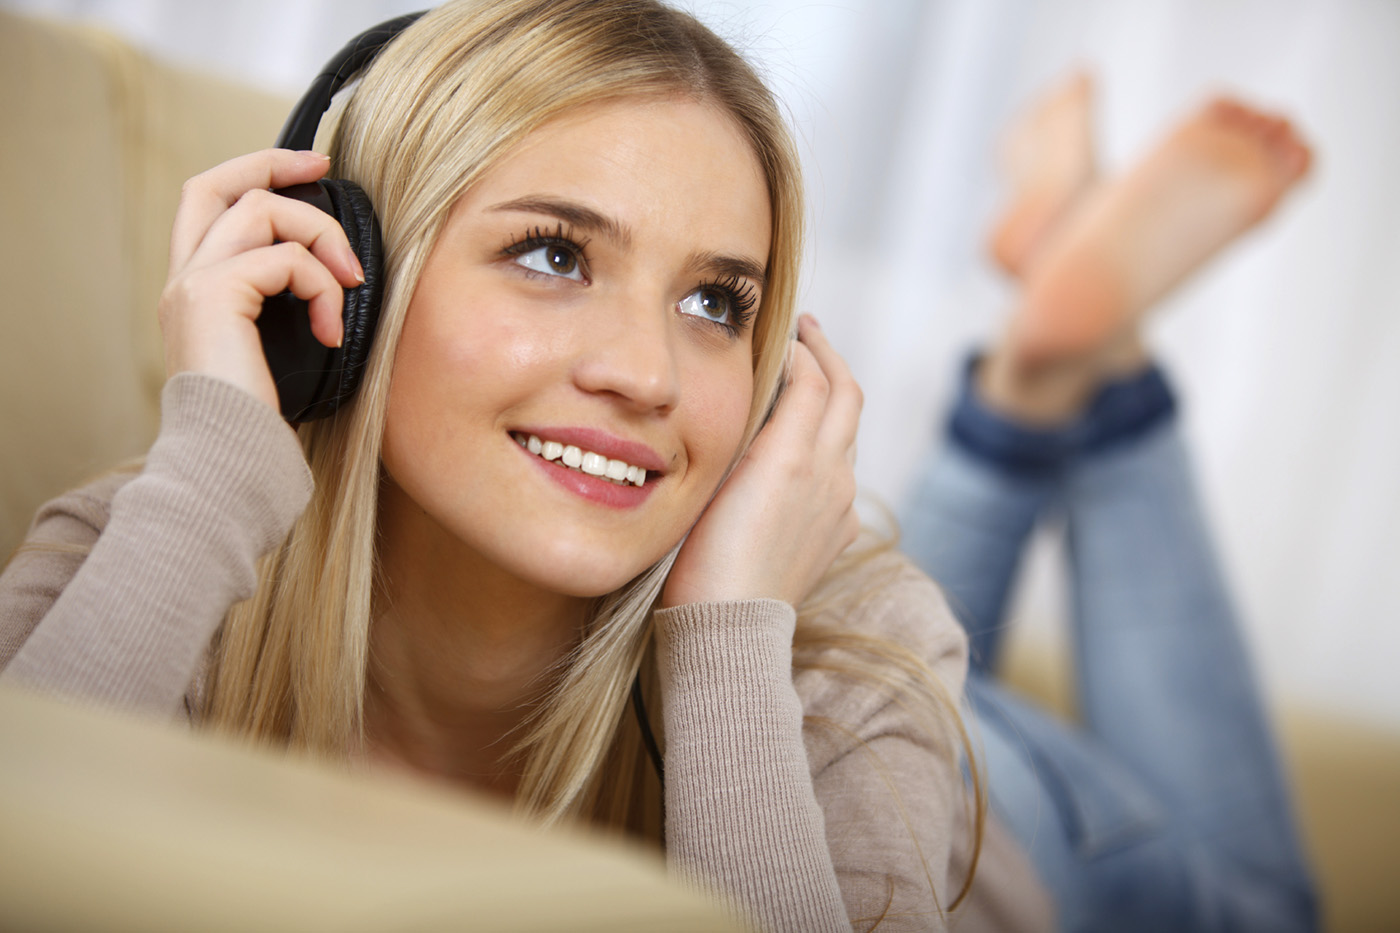 Headphone Audio Technica vs JBL